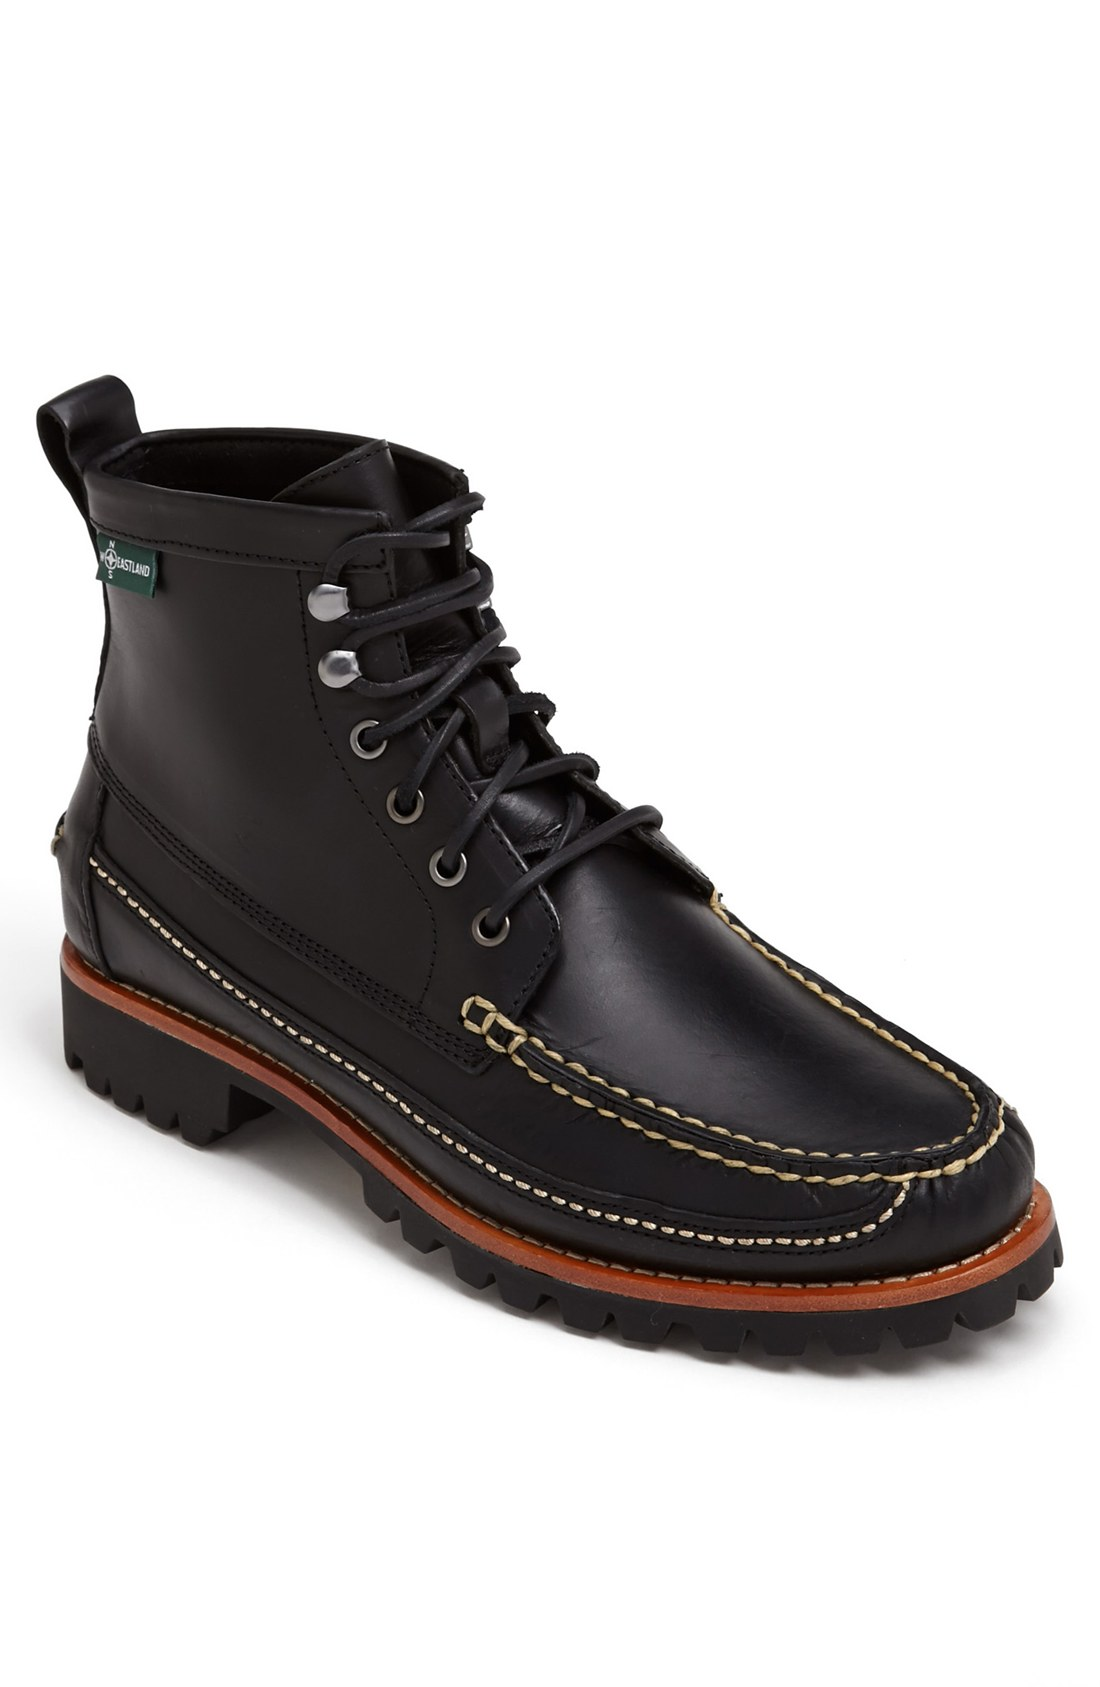 Eastland Franconia 1955 Moc Toe Boot In Black For Men